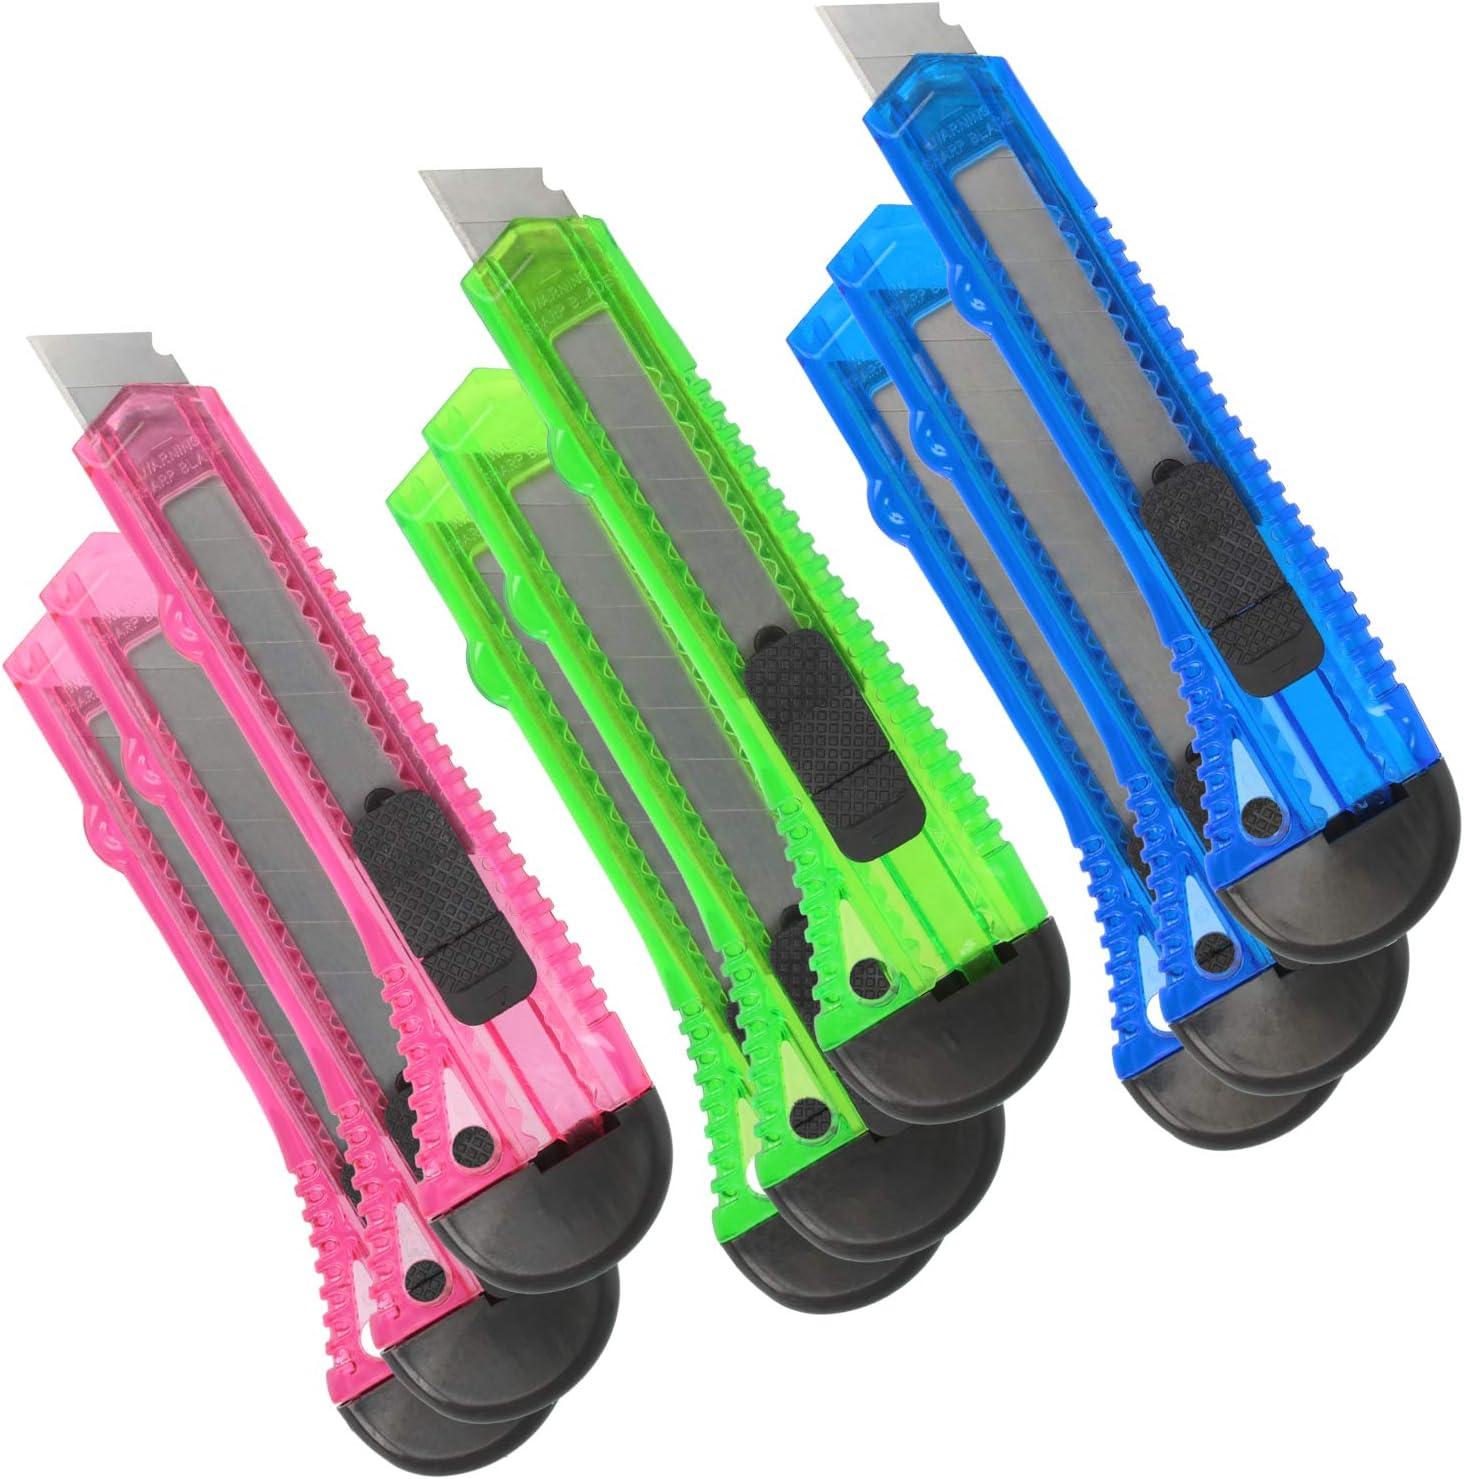 Teppichmesser mit Aluminium-Griff 14cm mit Aluminiumgriff - 02 St/ück com-four/® 2X 9 mm Cuttermesser